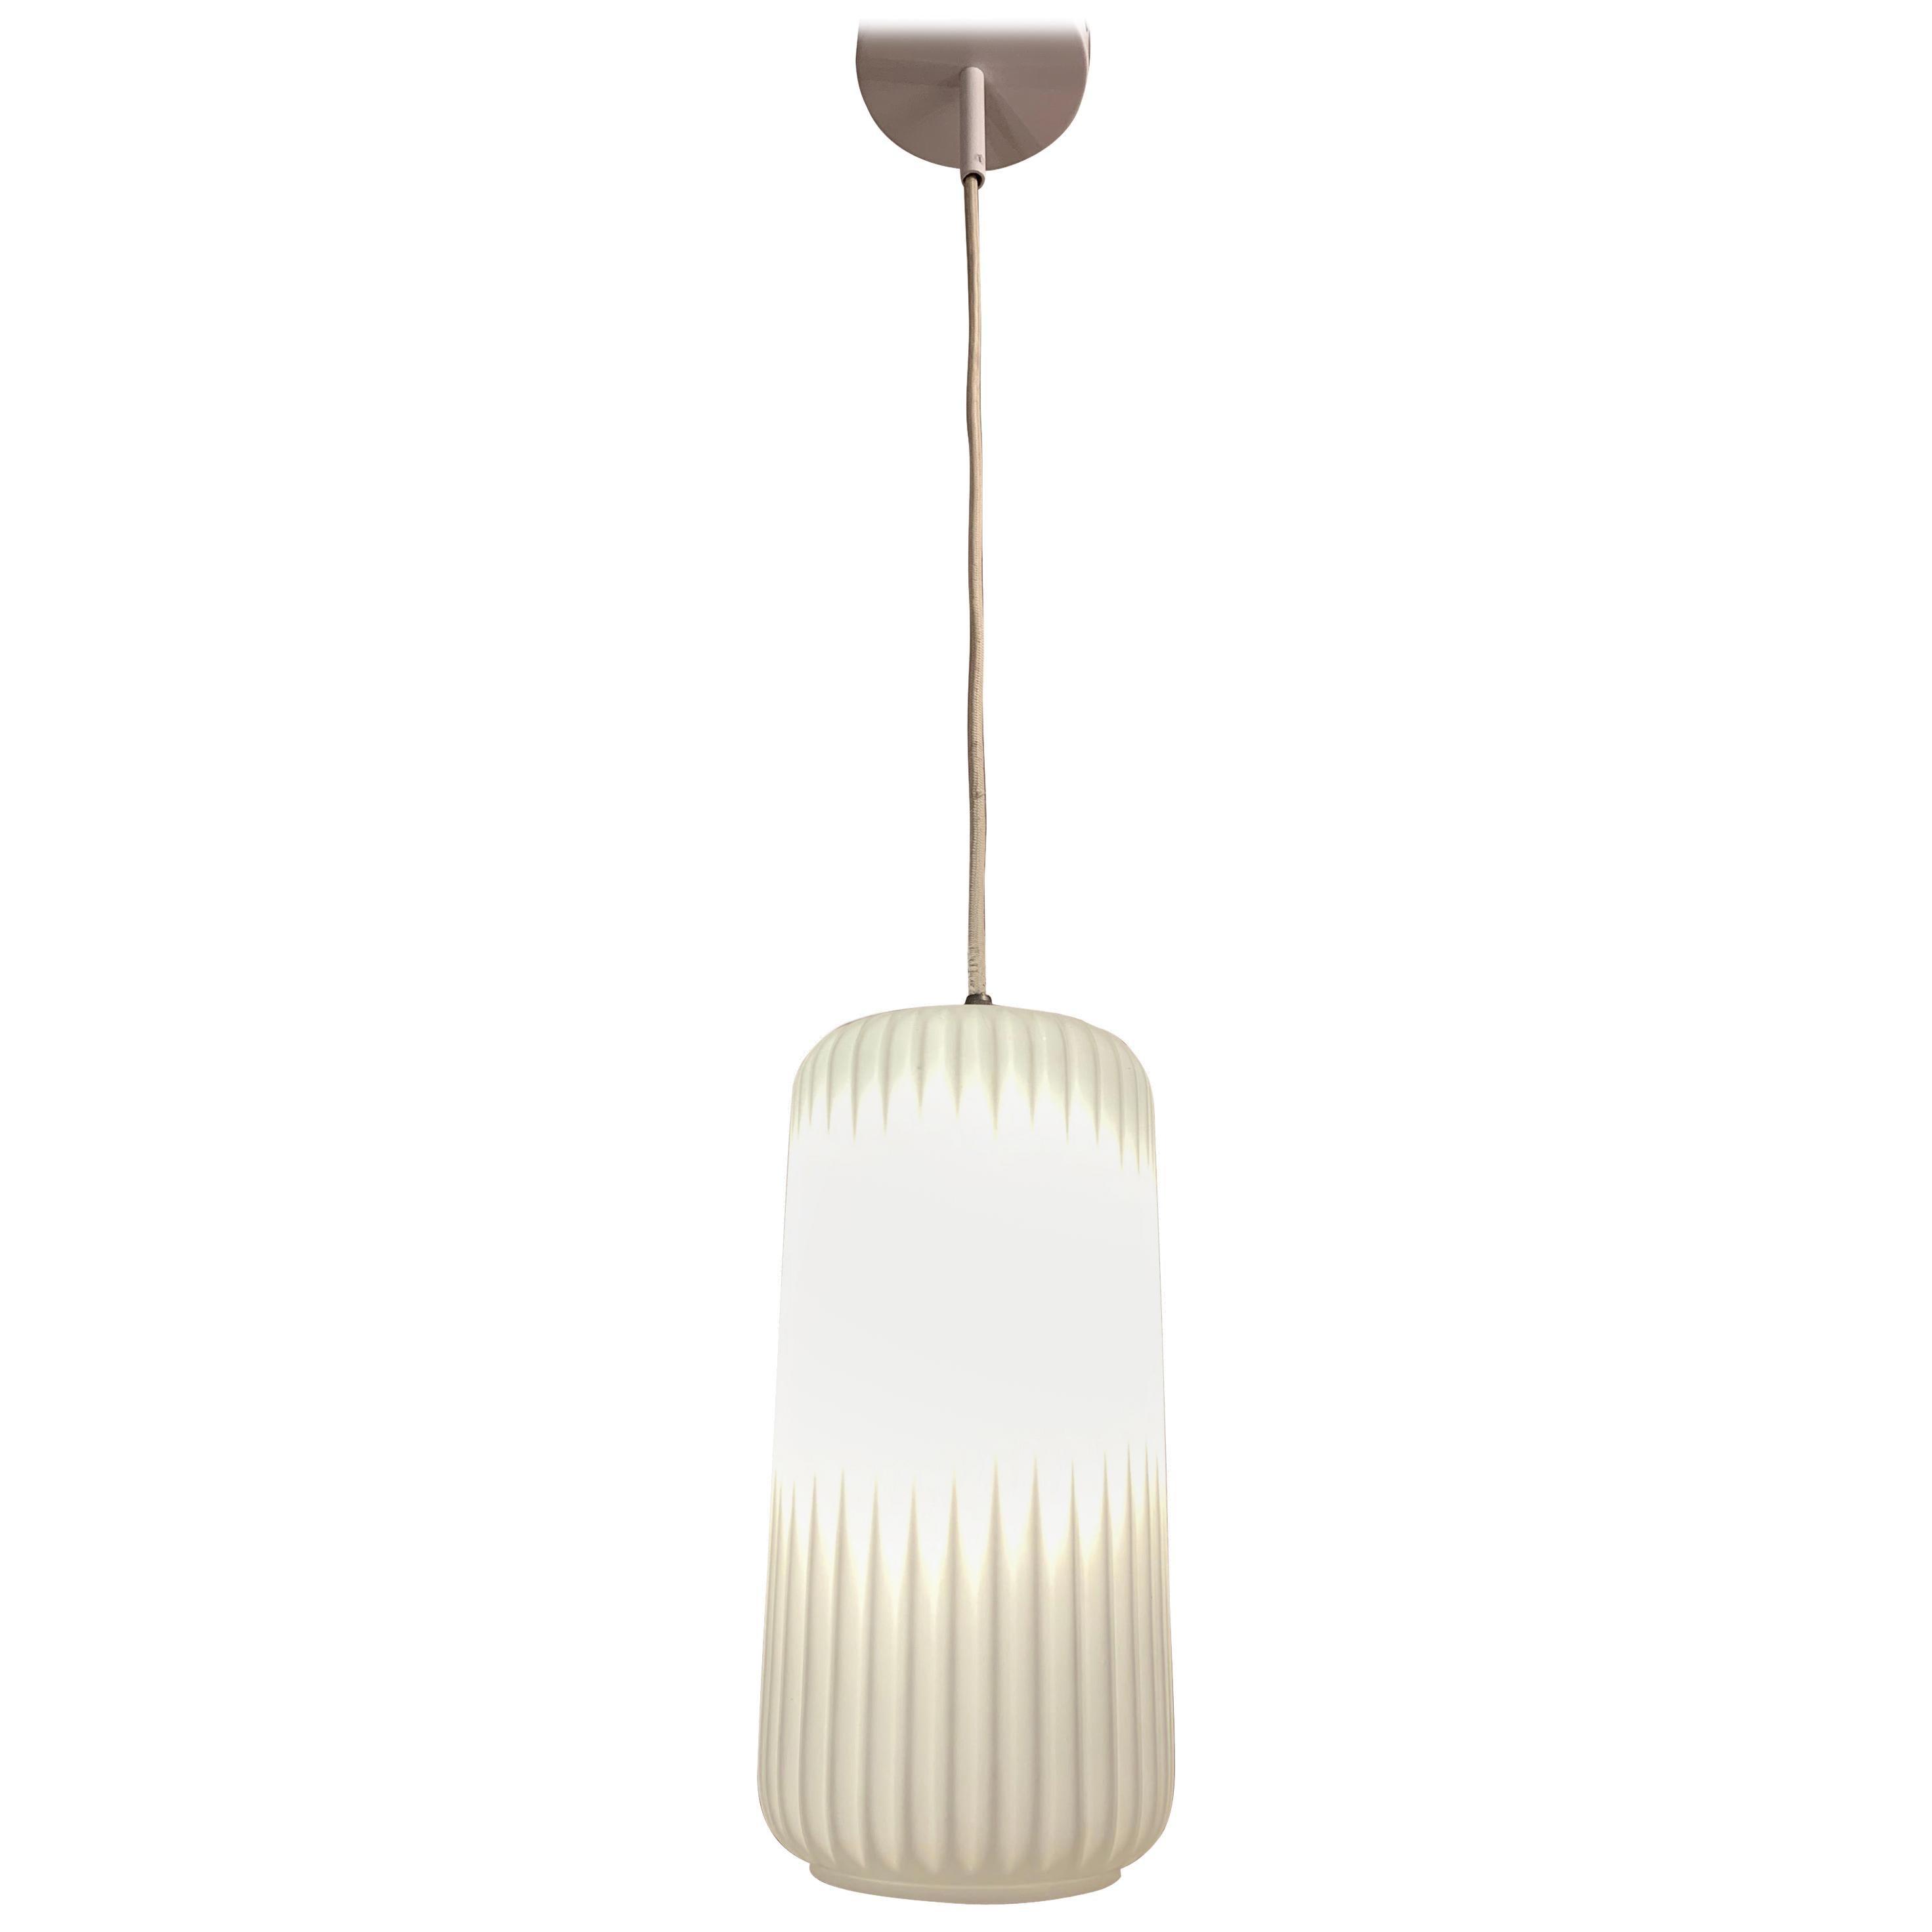 1950s Italian Arredoluce Style Opaline Ribbed Glass Pendant Hanging Light